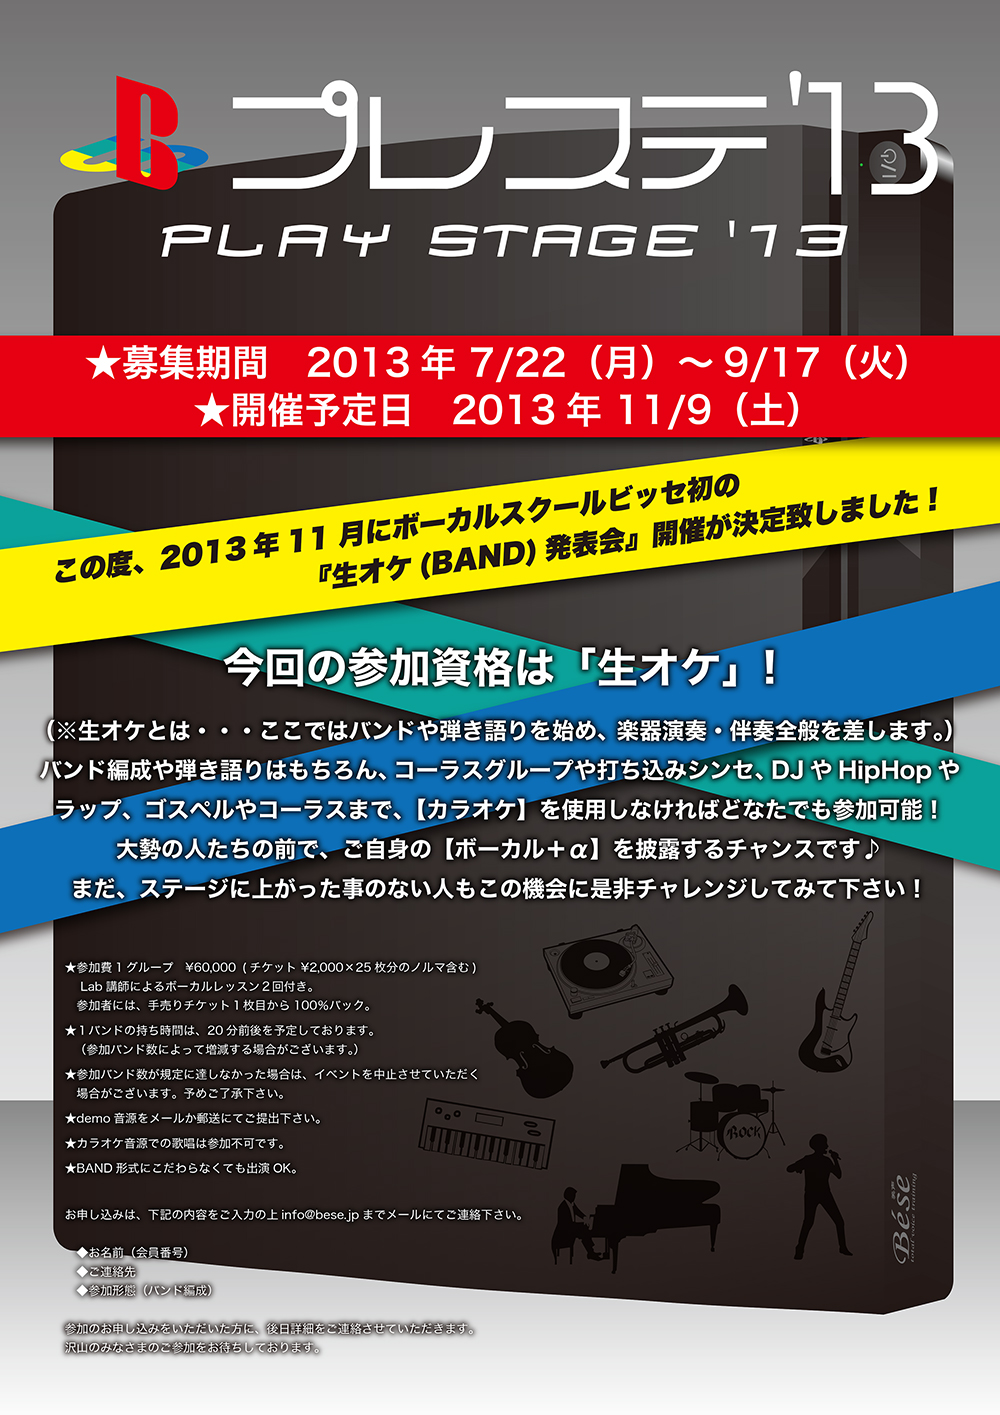 Pray Stage'13